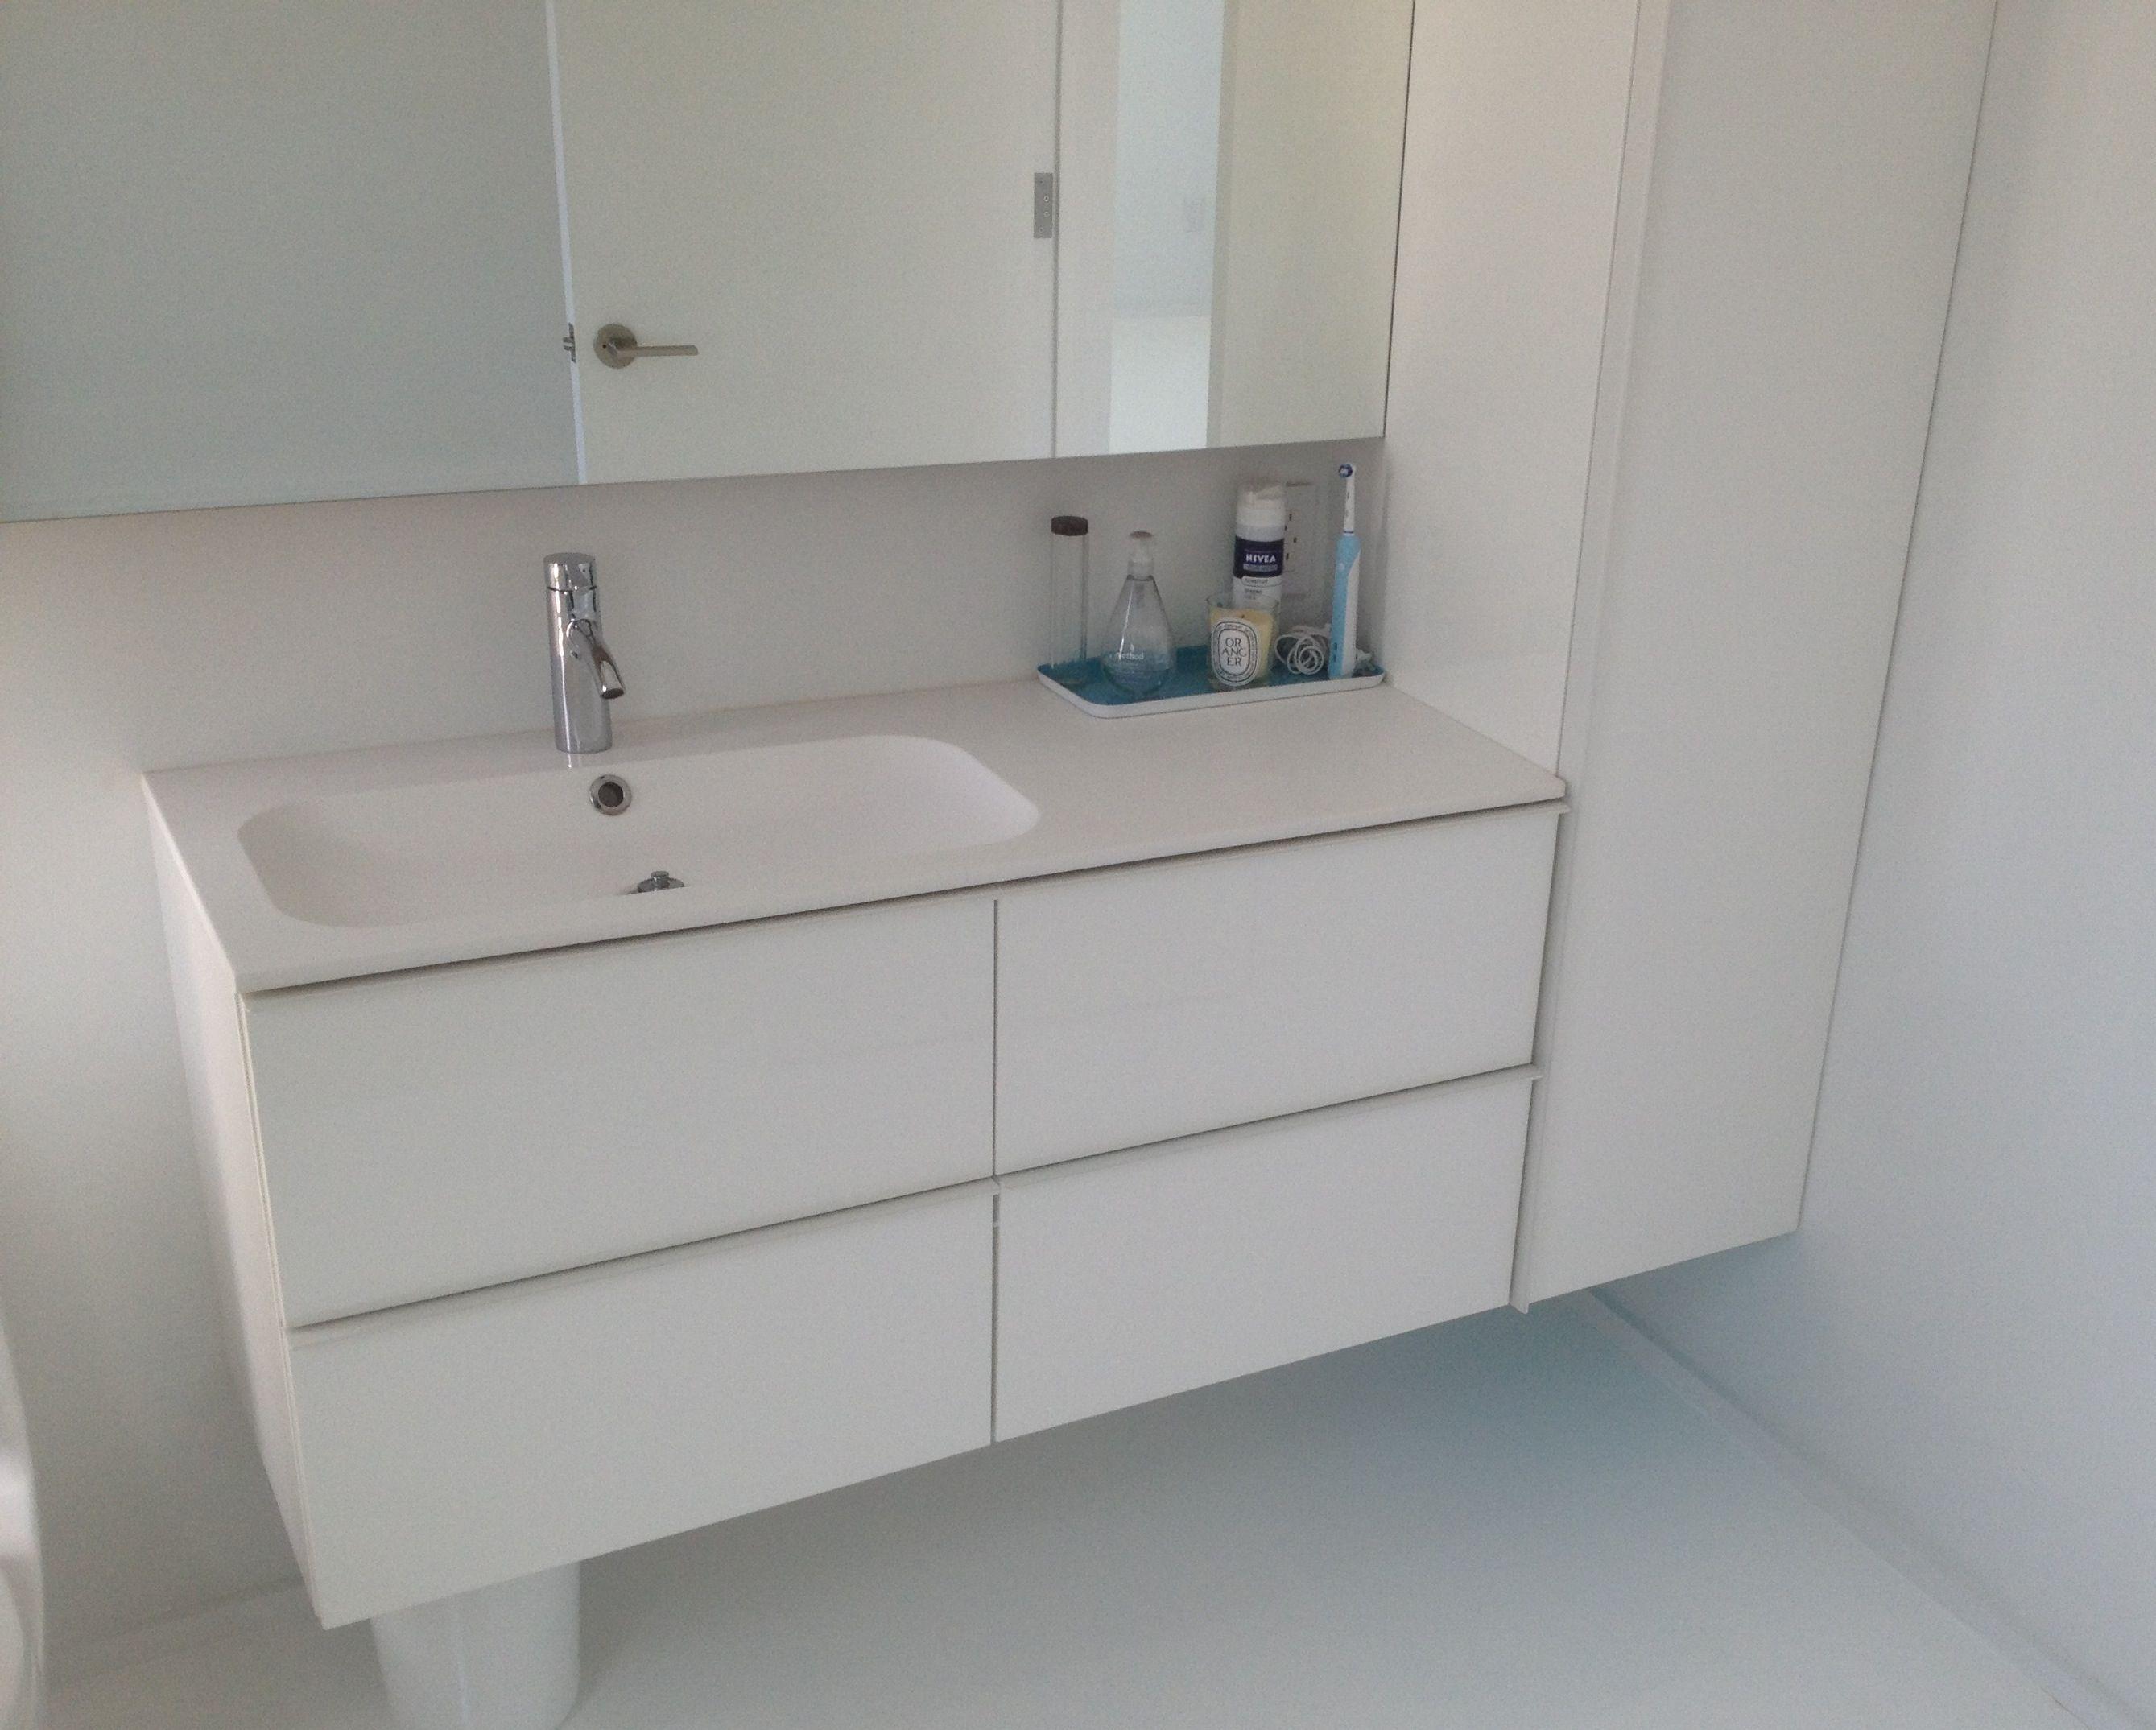 This Image Is About Minimalist Ikea Bathroom Vanities And Titled High End Bathroom Vanities With D Ikea Bathroom Vanity Ikea Bathroom White Vanity Bathroom